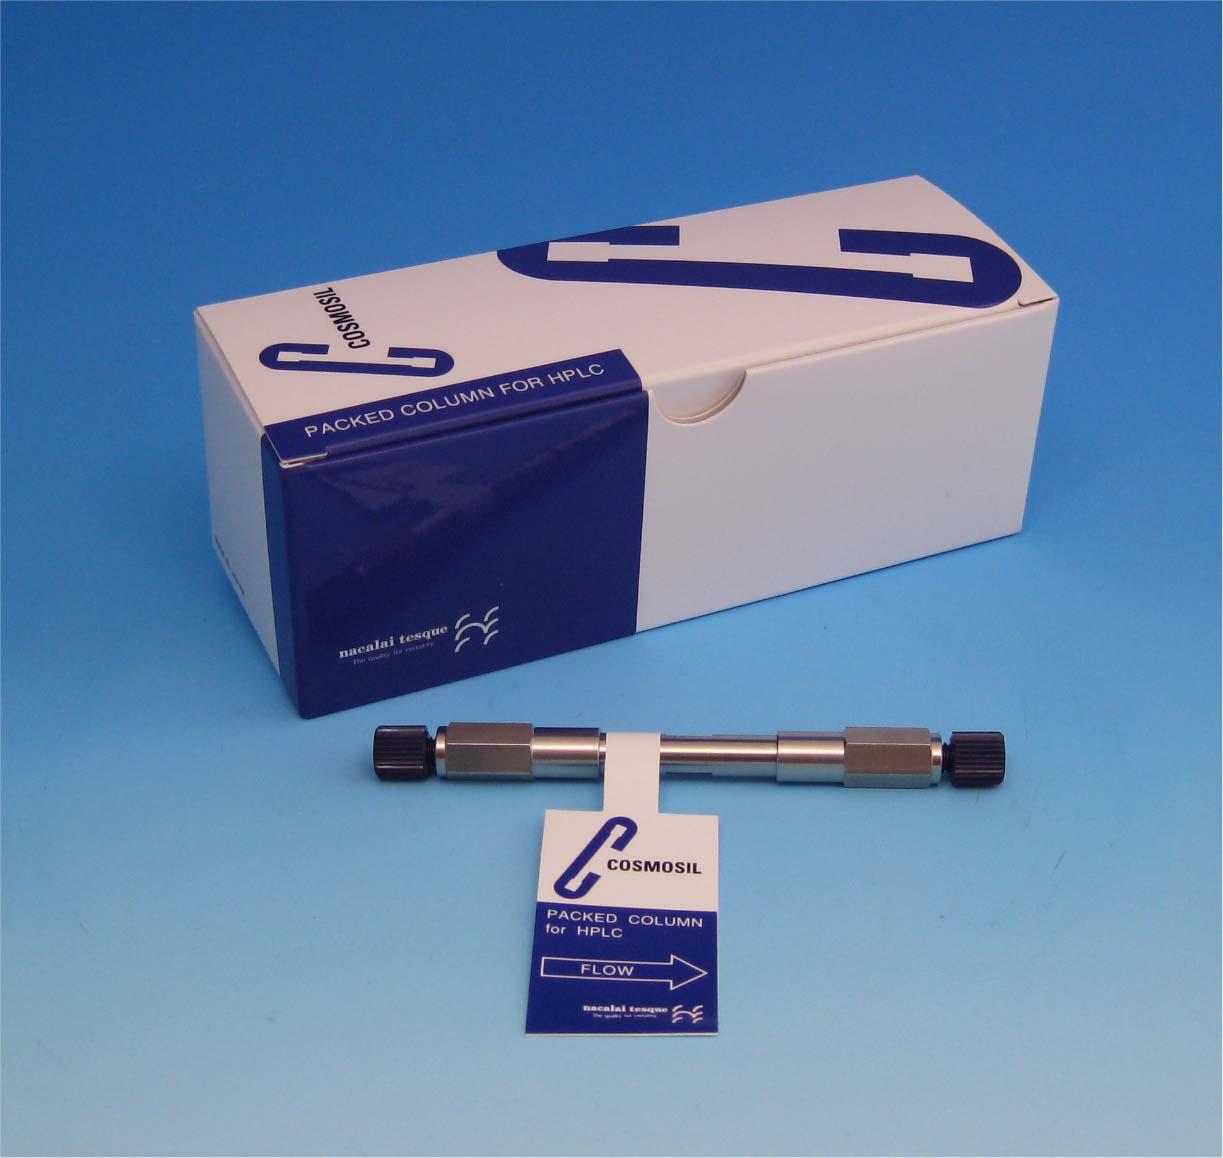 COSMOSIL(R) 5C18-AR-Ⅱ Packed Column 1.0mmI.D.x50mm